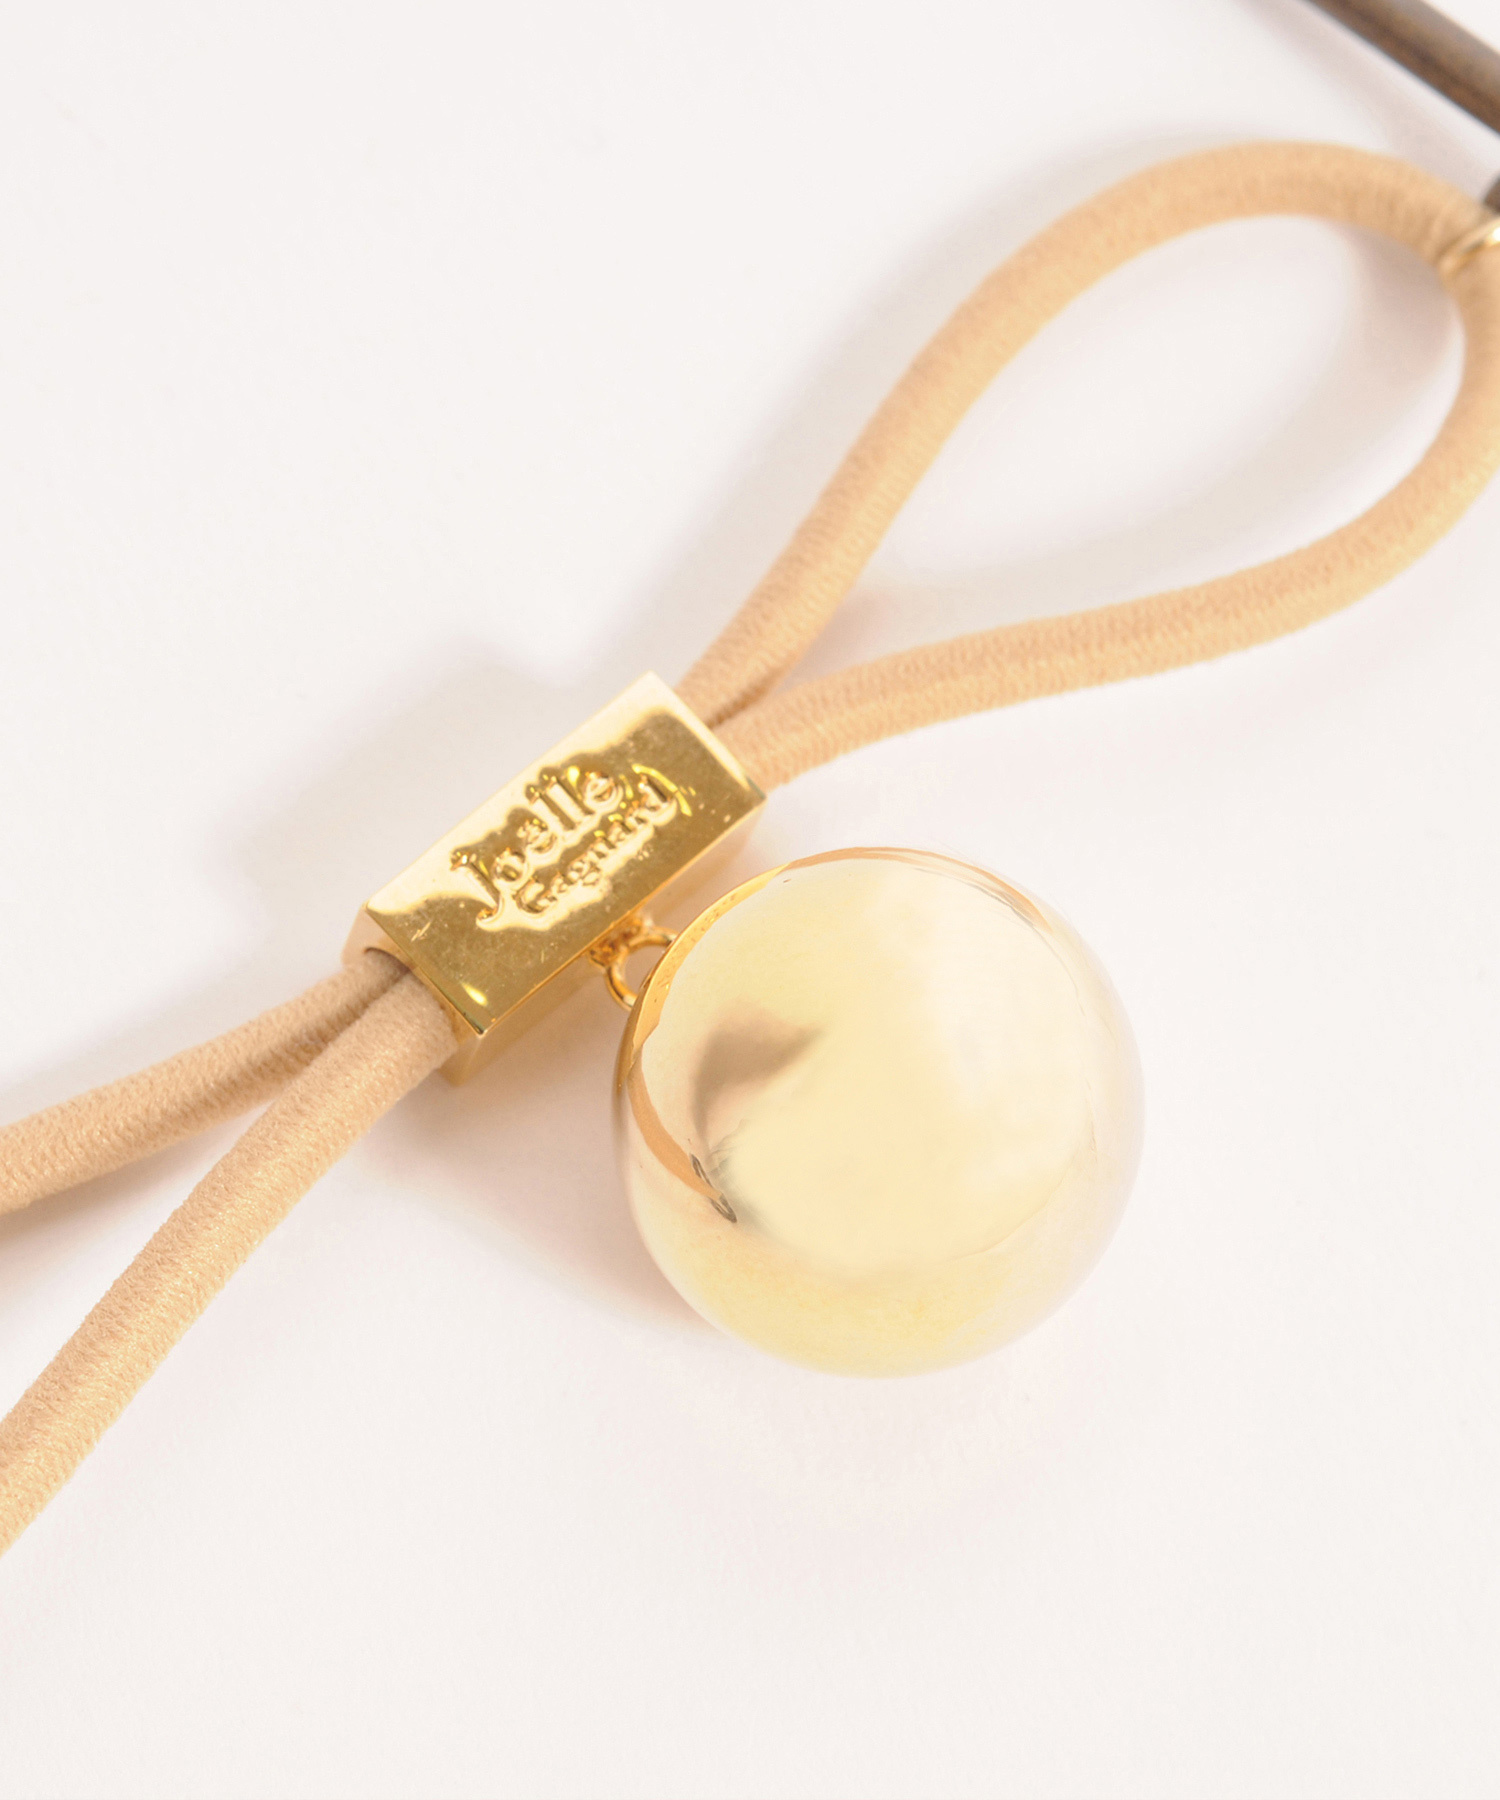 Joe19AW-01 hook design gom -ball (gold)